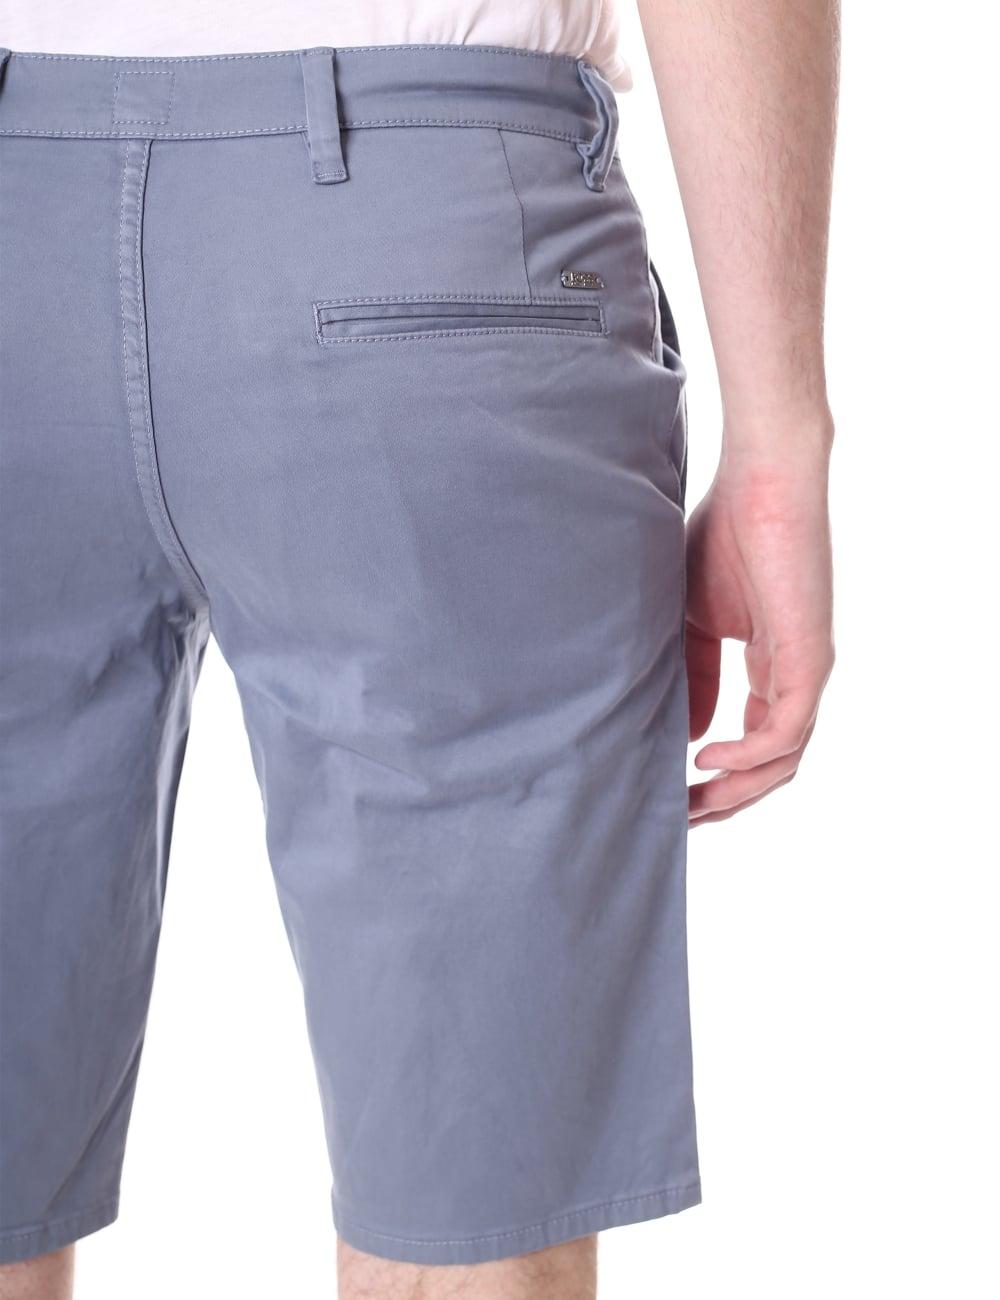 44202697 Boss Orange Men's Slim Fit Chino Short